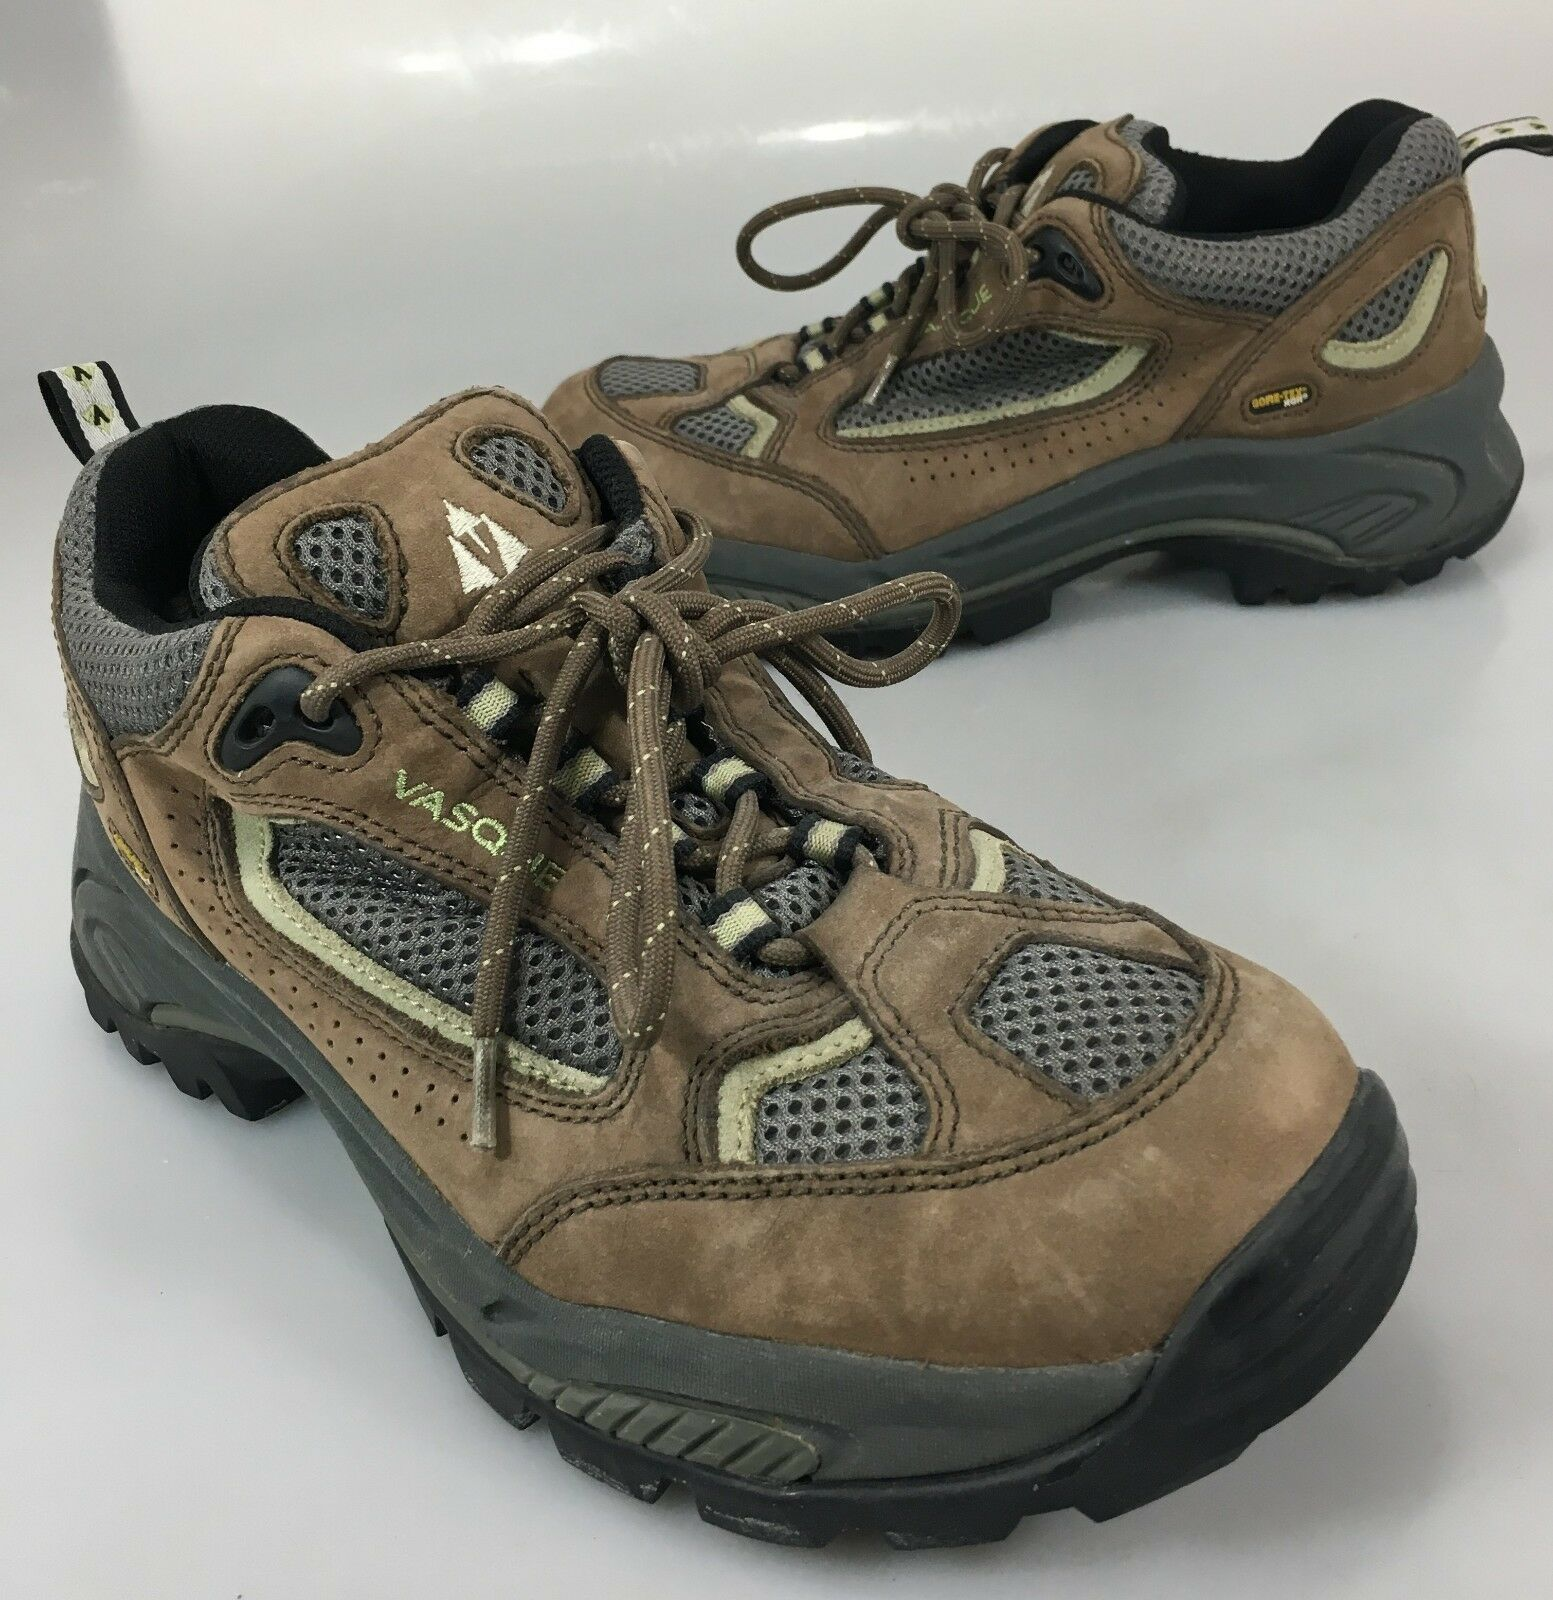 Vasque Womens 9 M Mantra Brown Gray Gore-Tex Hiking Trail Shoes Vibram Soles